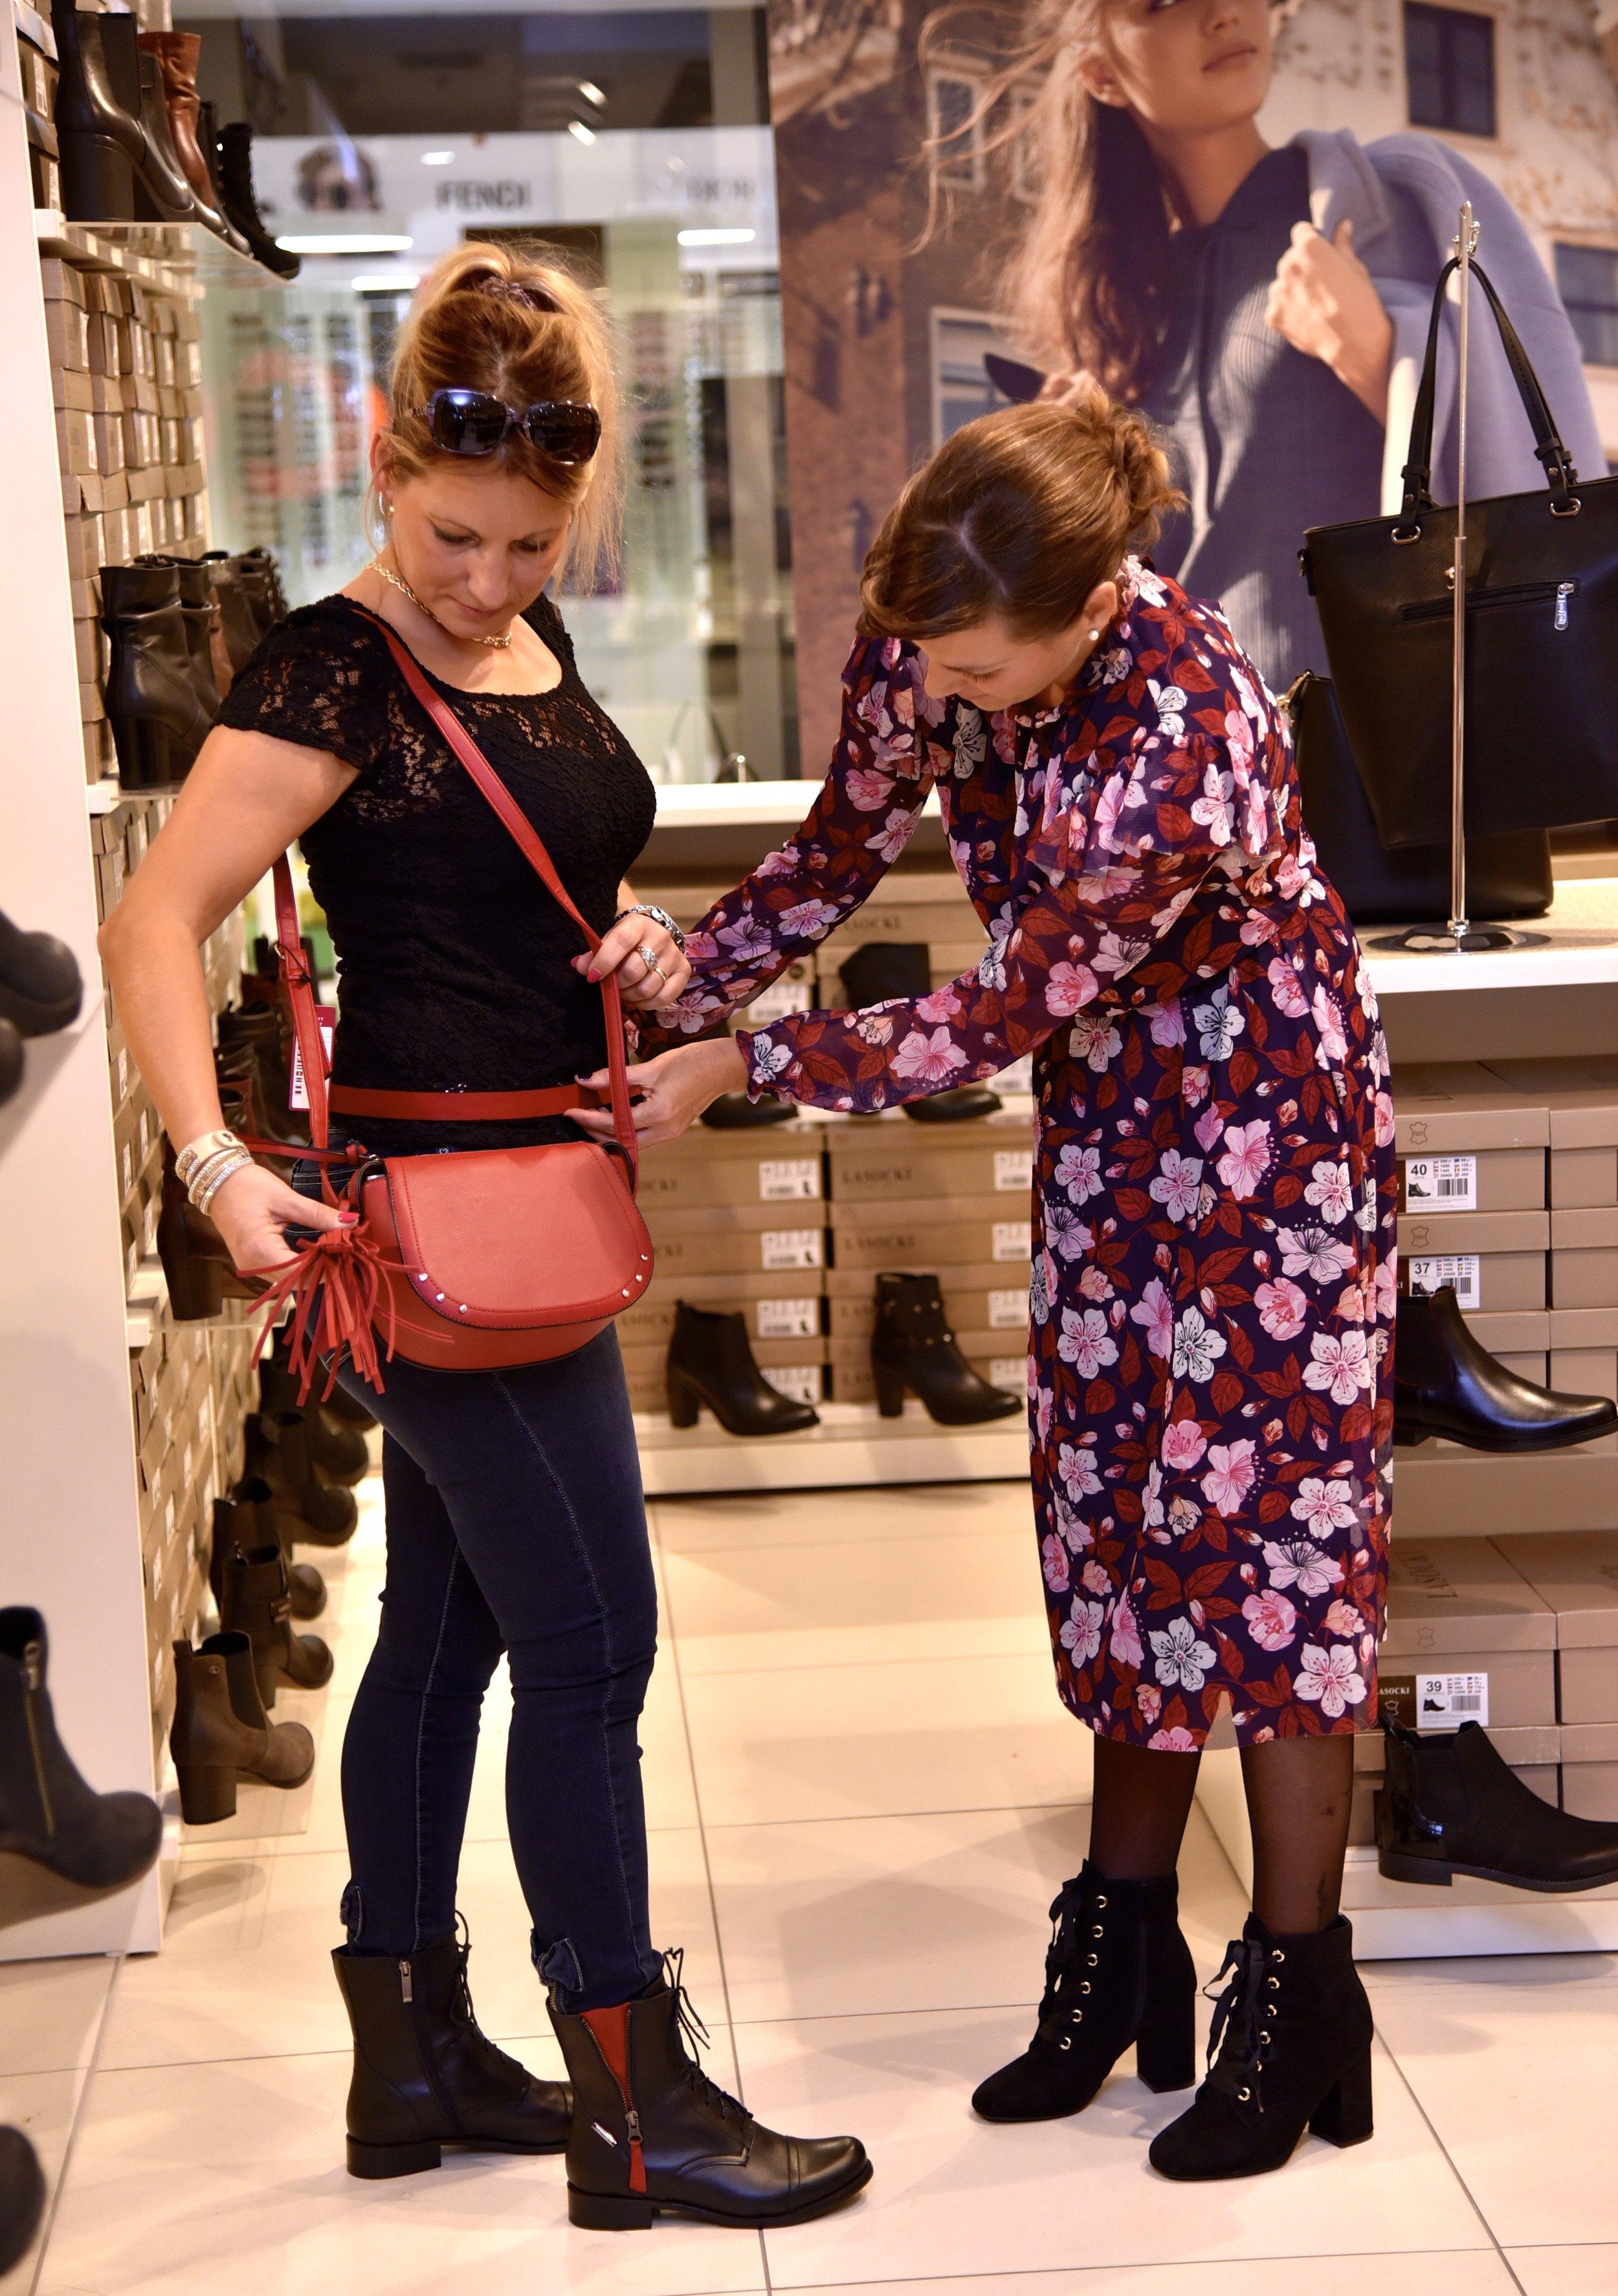 Shoes, bag, belt